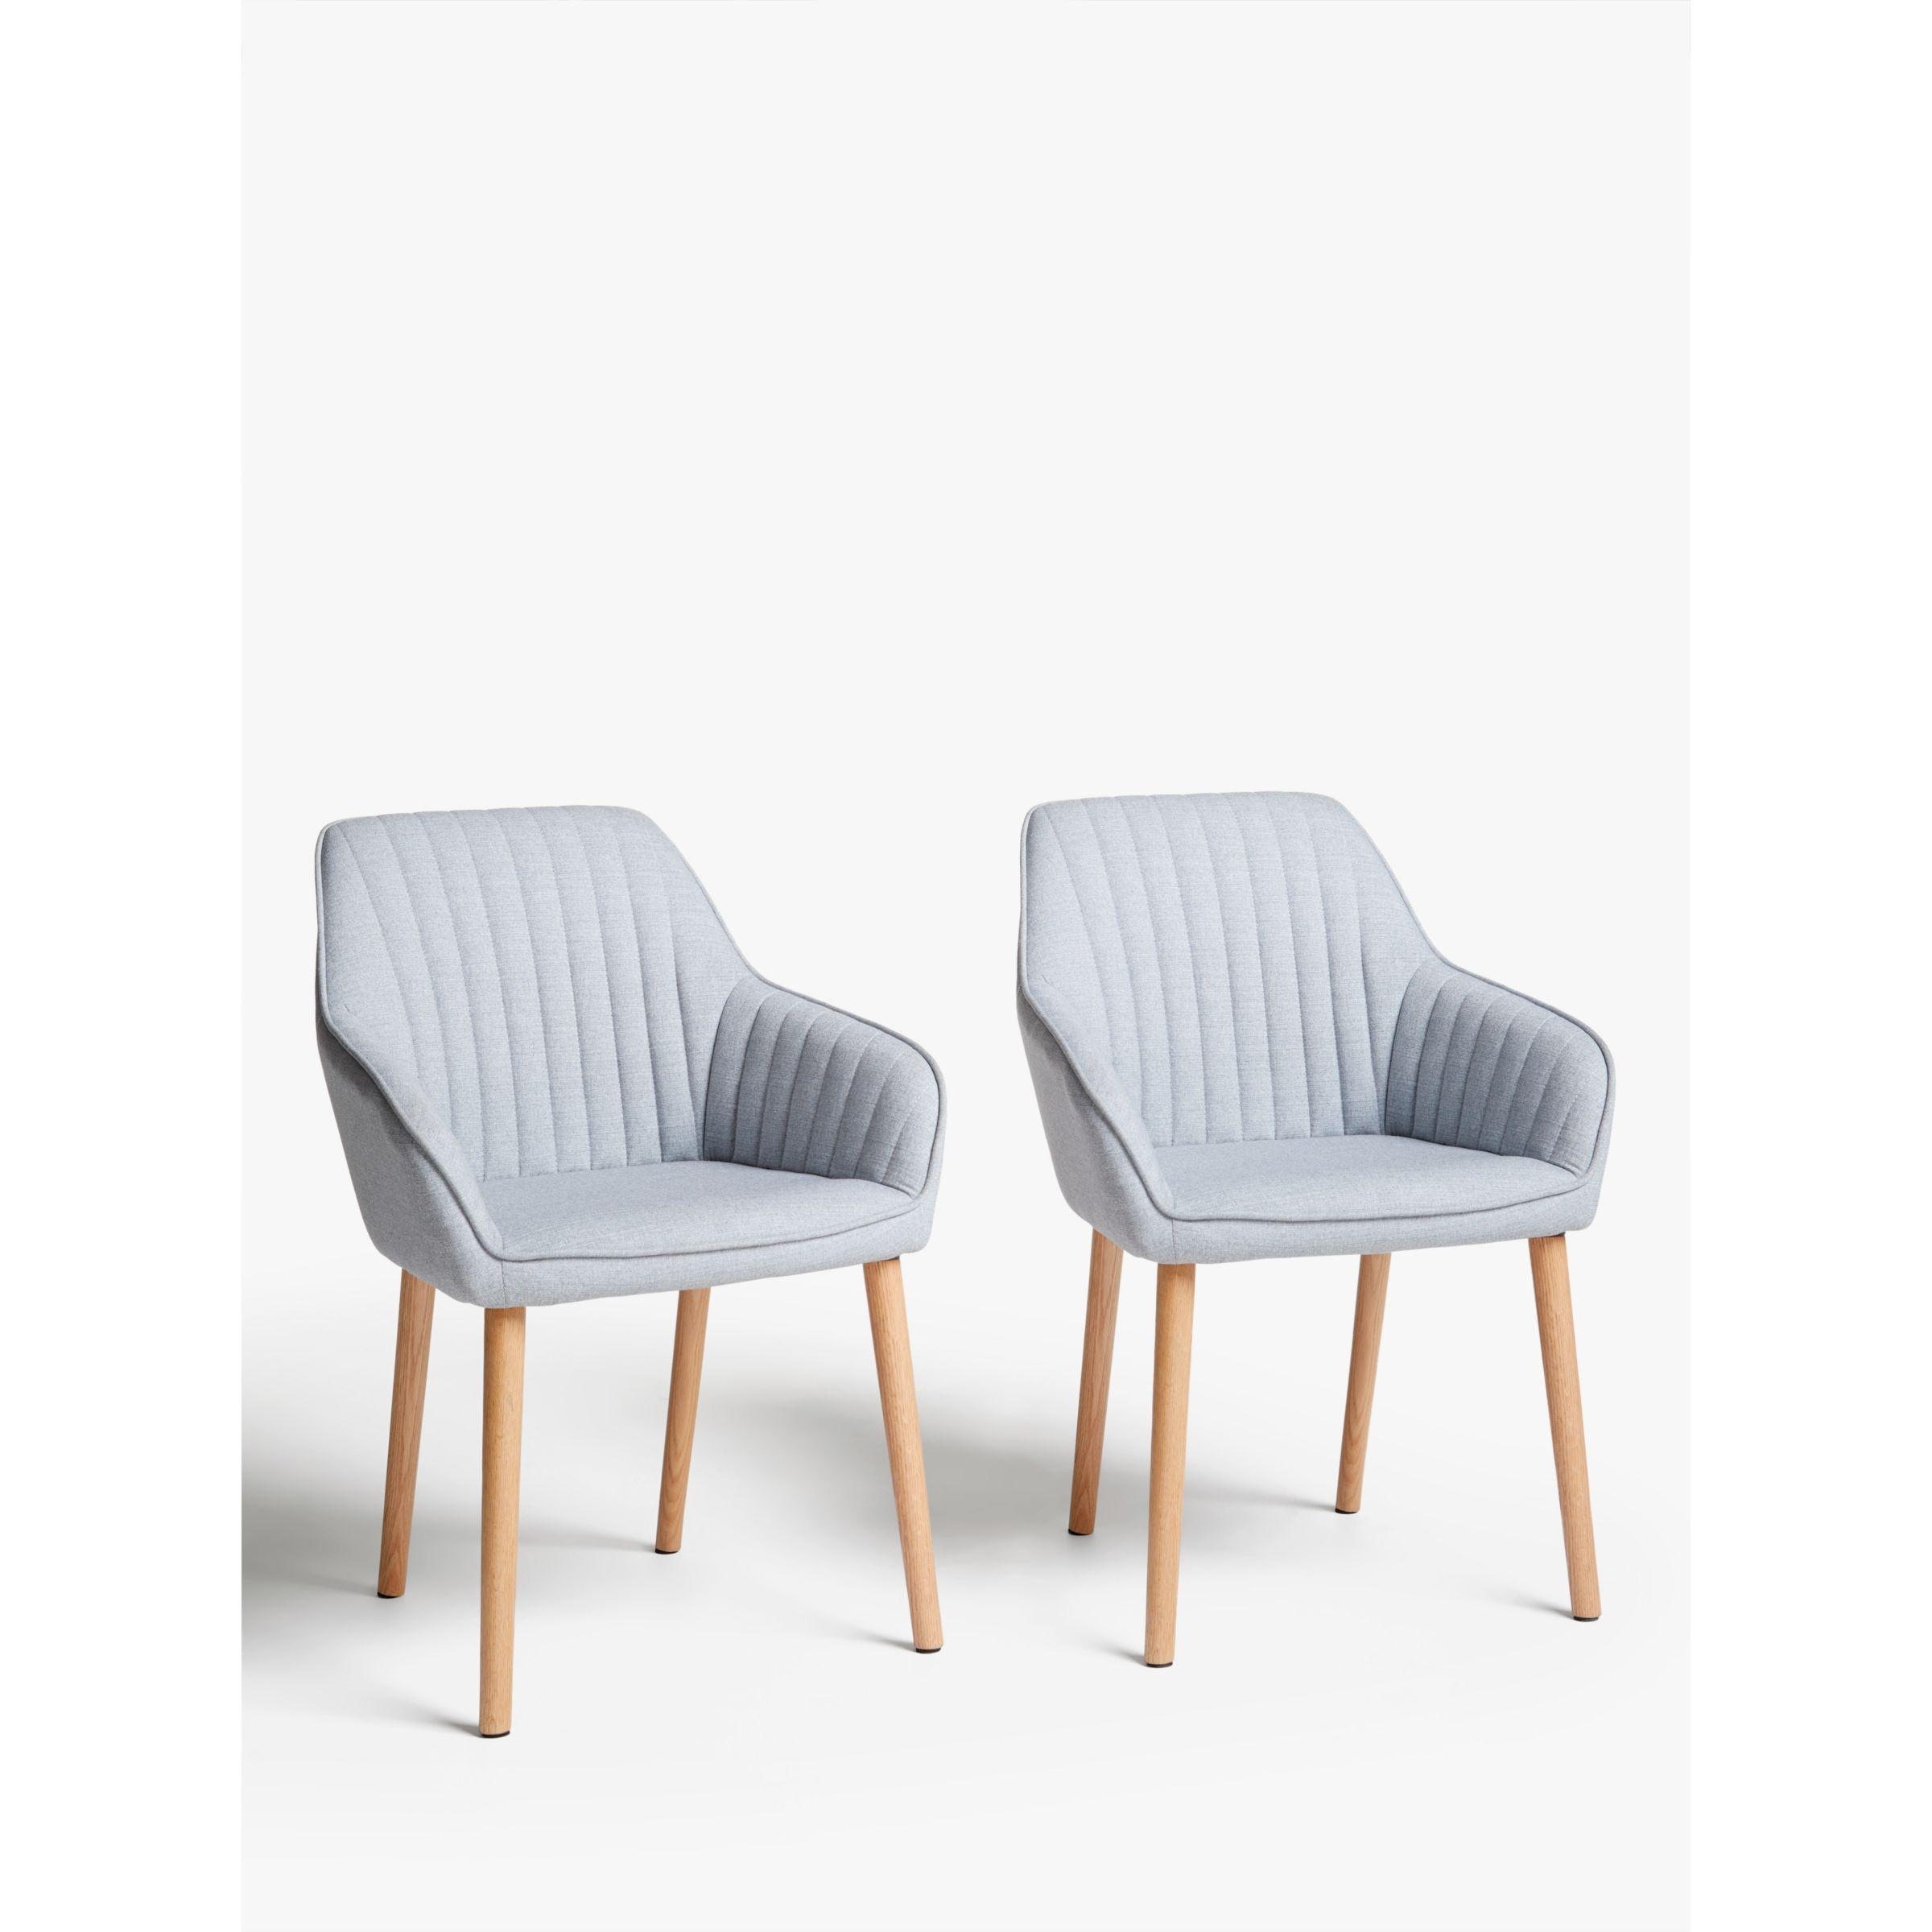 John Lewis & Partners Toronto Dining Armchairs, Set of 9, Grey